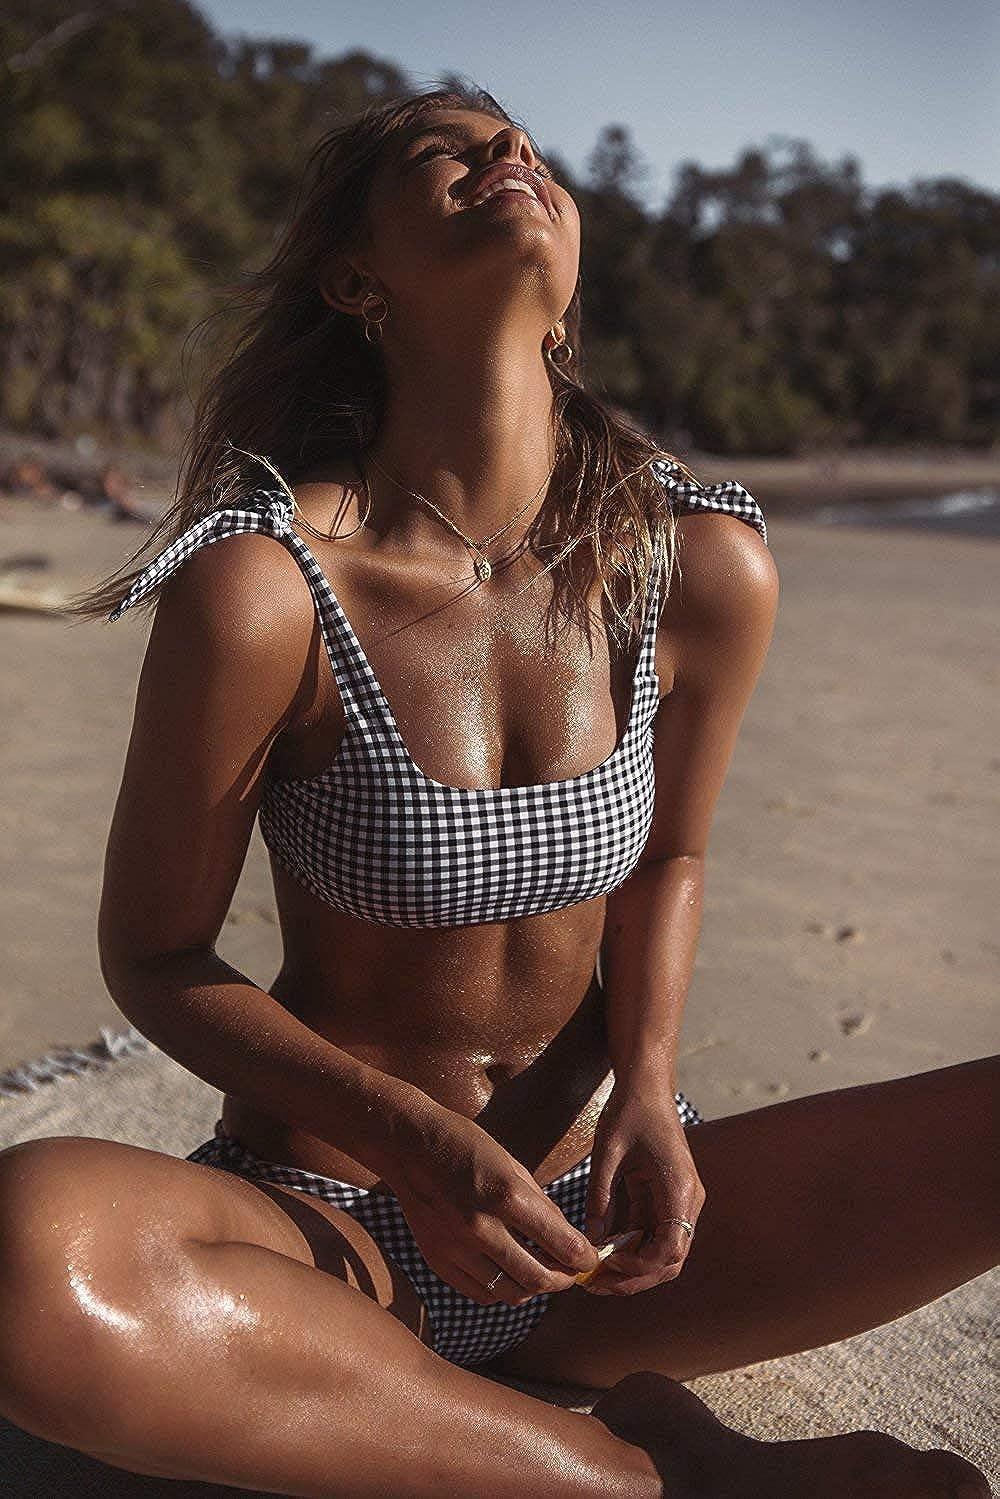 heekpek Mujer Conjunto De Bikini para Bandeau Bandeau Mujer Traje de ba/ño Brasile/ño Push-Up Traje De Ba/ño De Playa